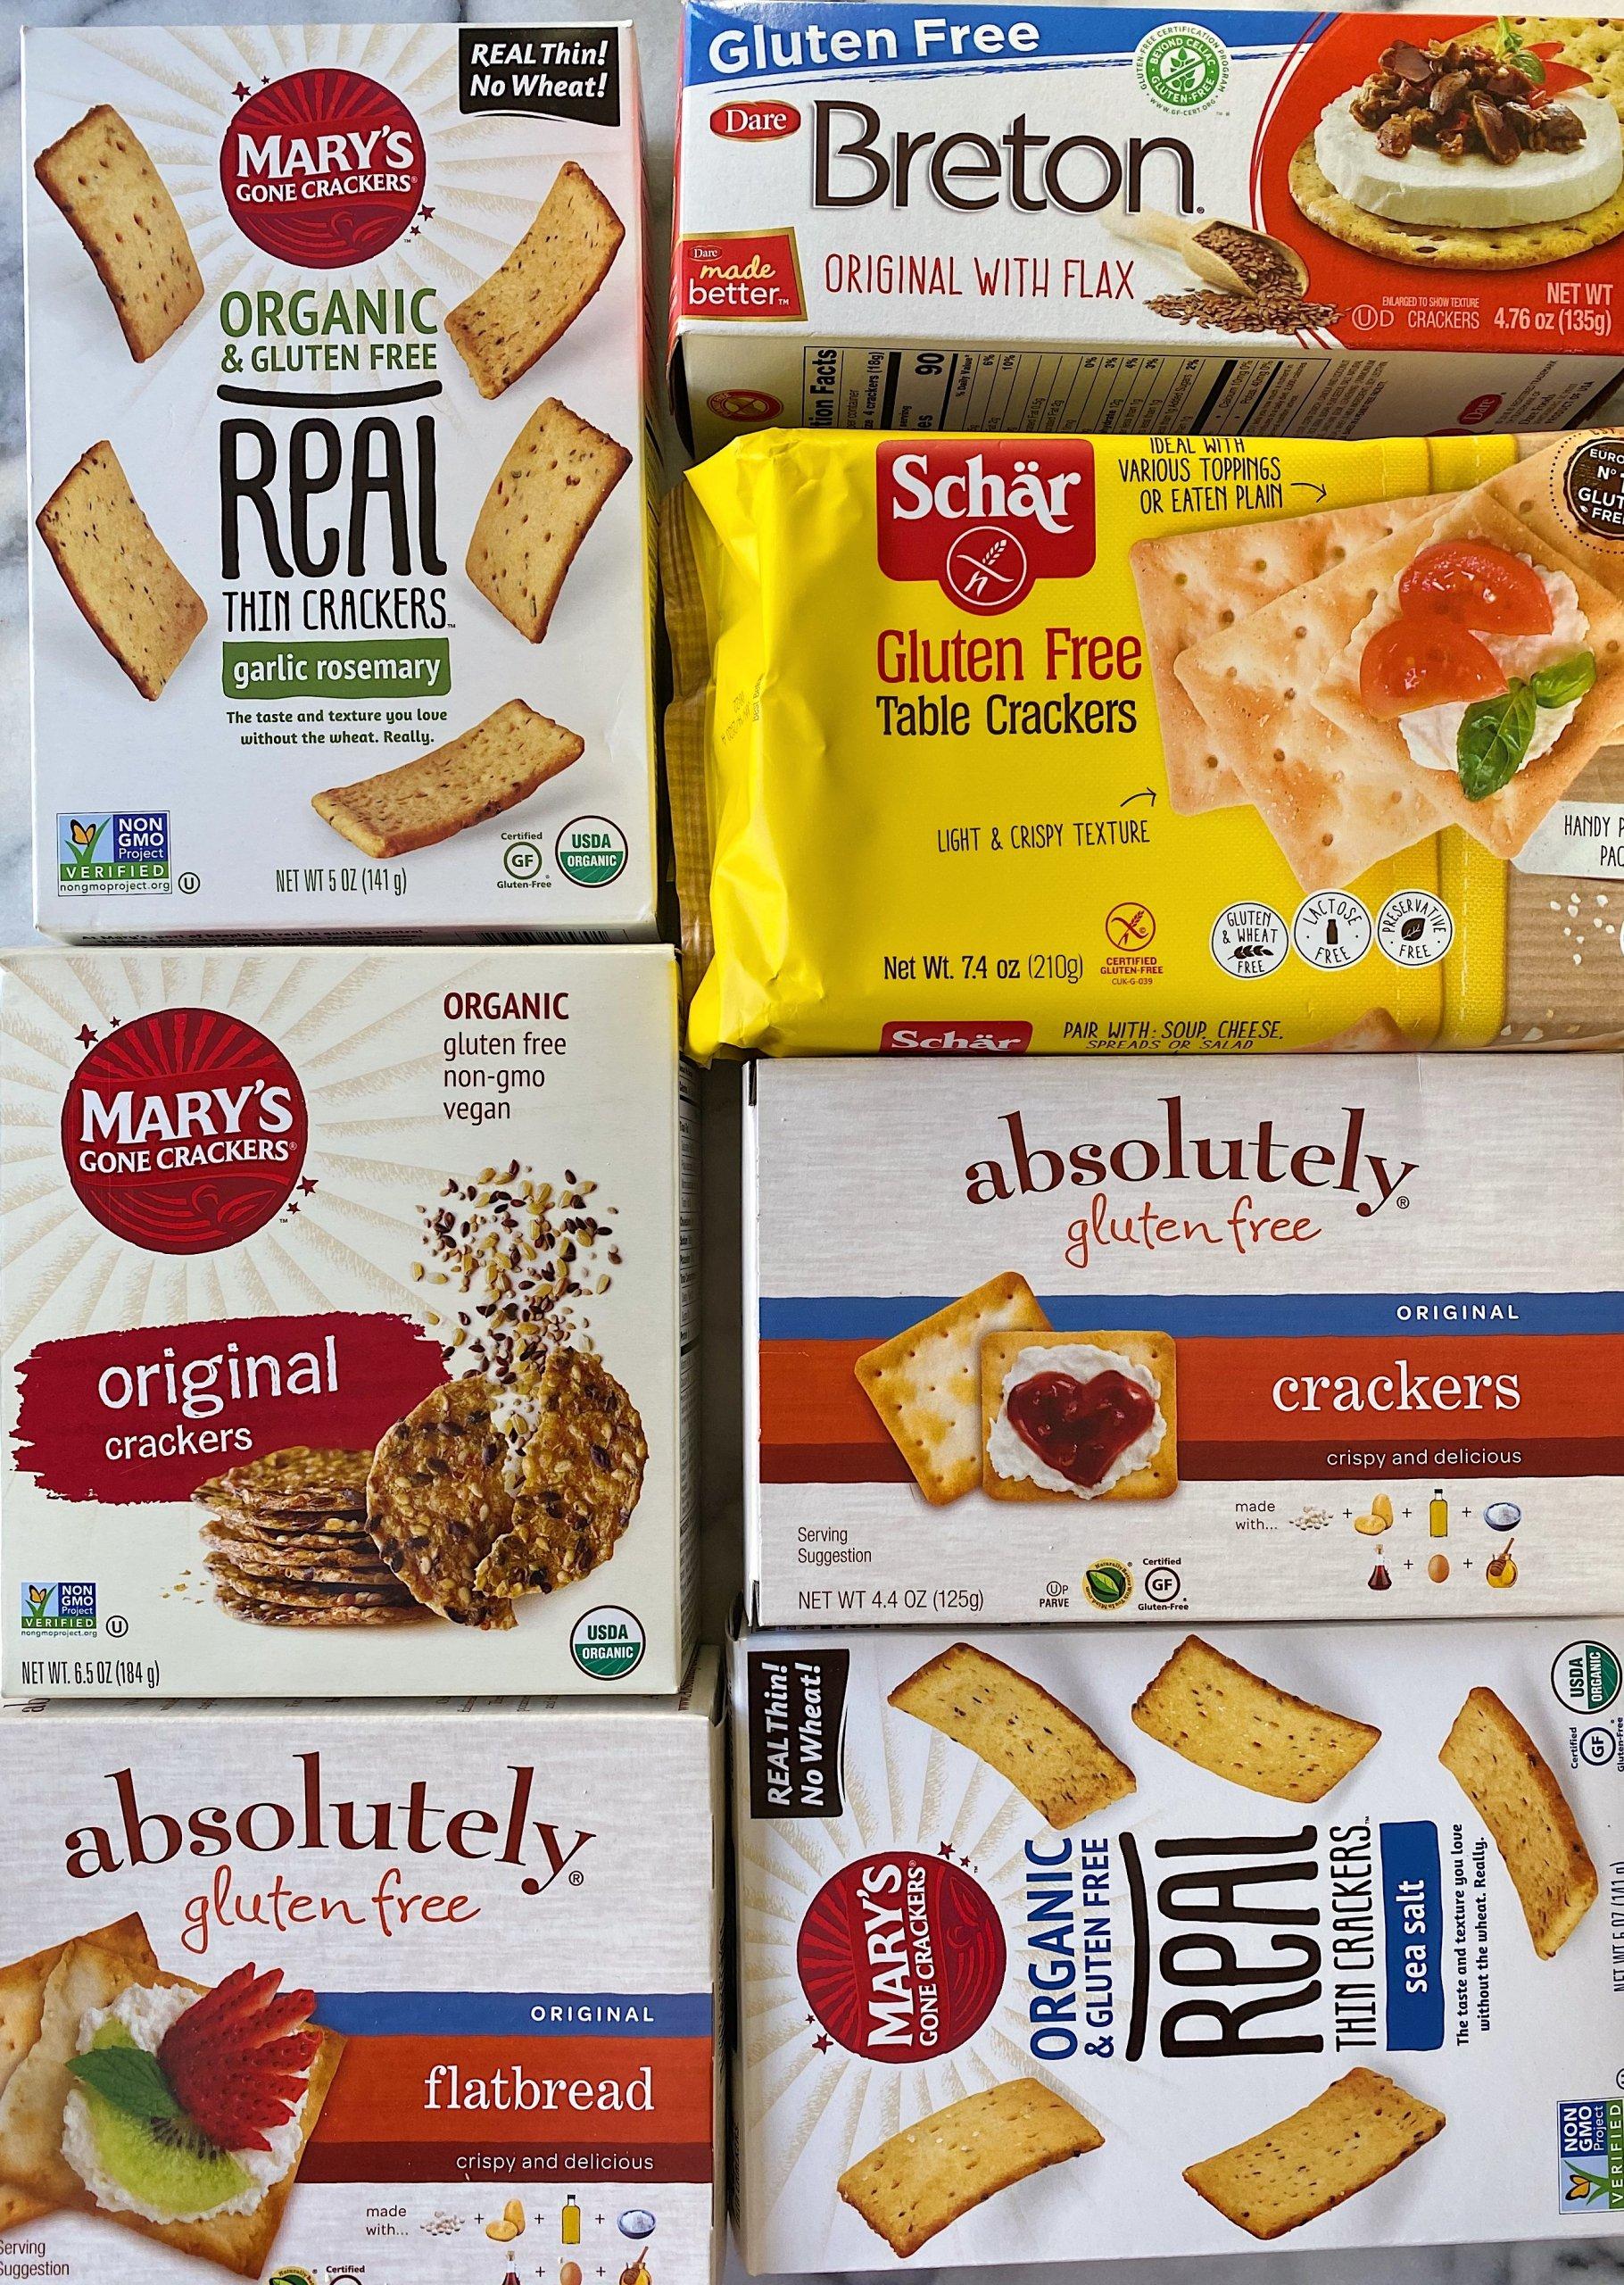 easy antipasto lunch gluten free #glutenfree #glutenfreerecipes www.healthygffamily.com